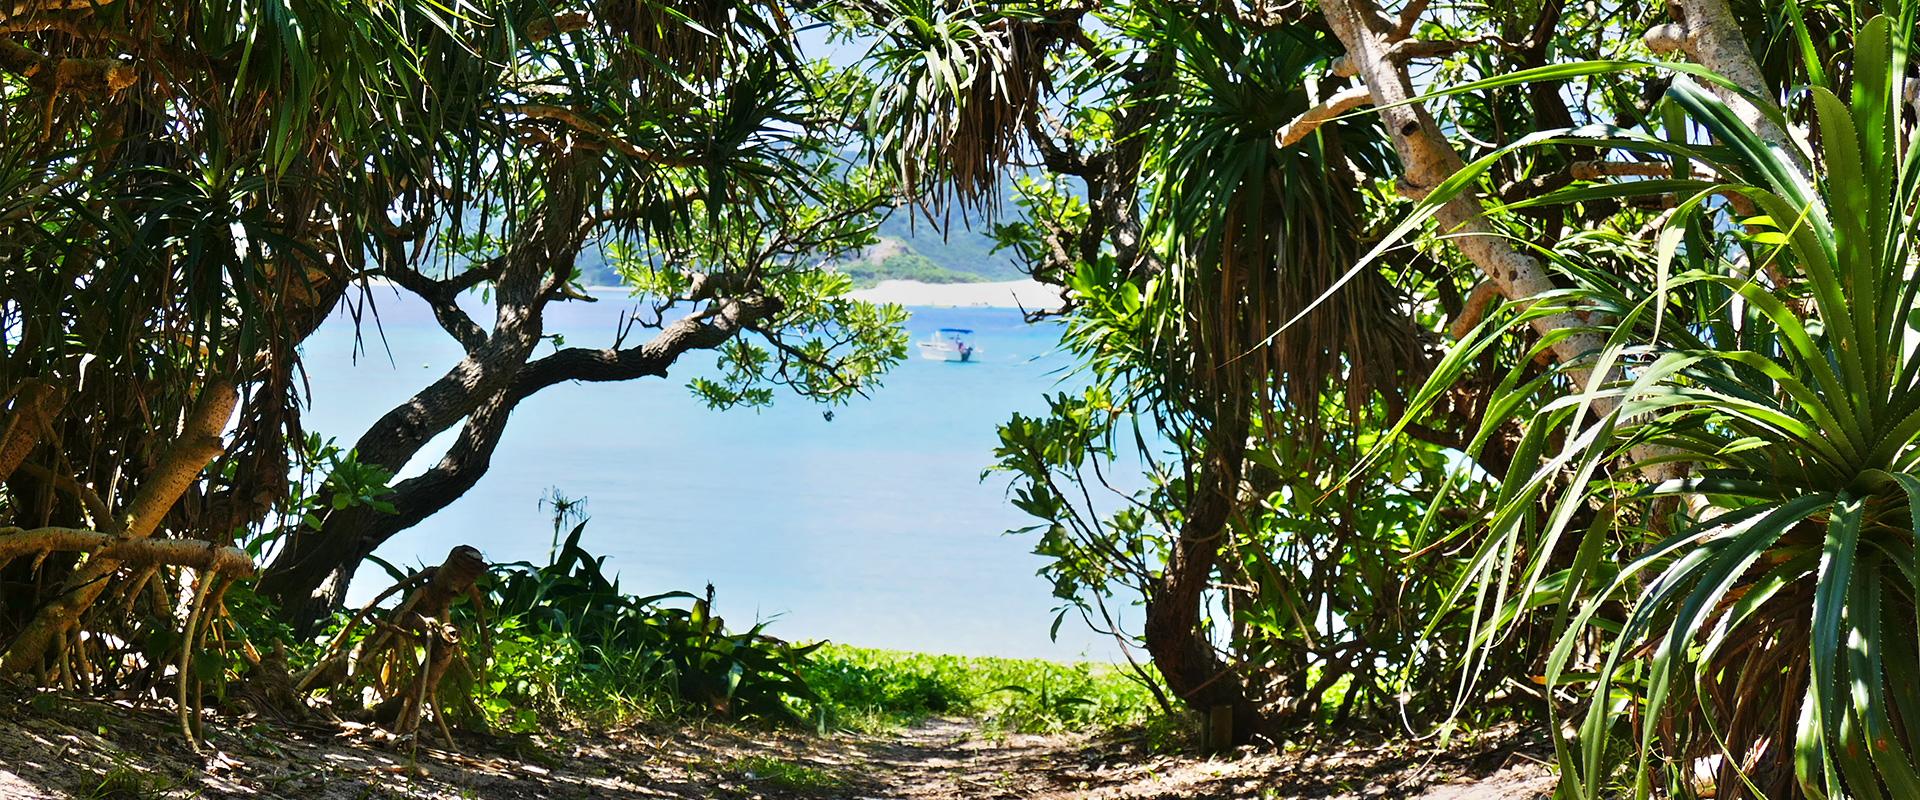 La isla de Zamami.